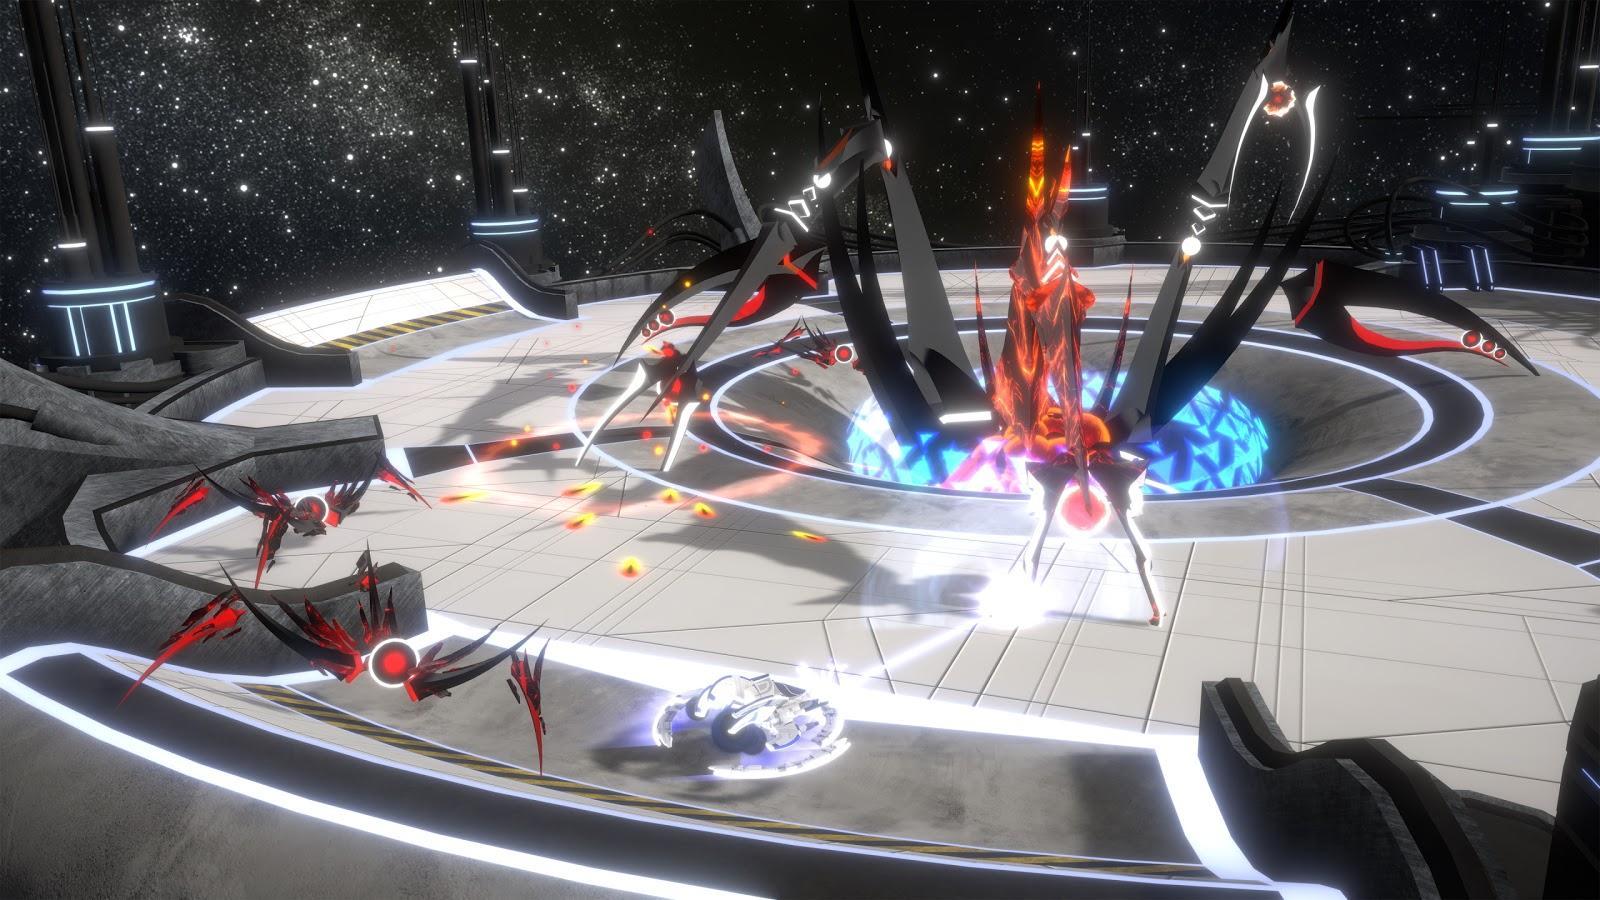 Аркадный шутер Curved Space анонсирован для Nintendo Switch 2